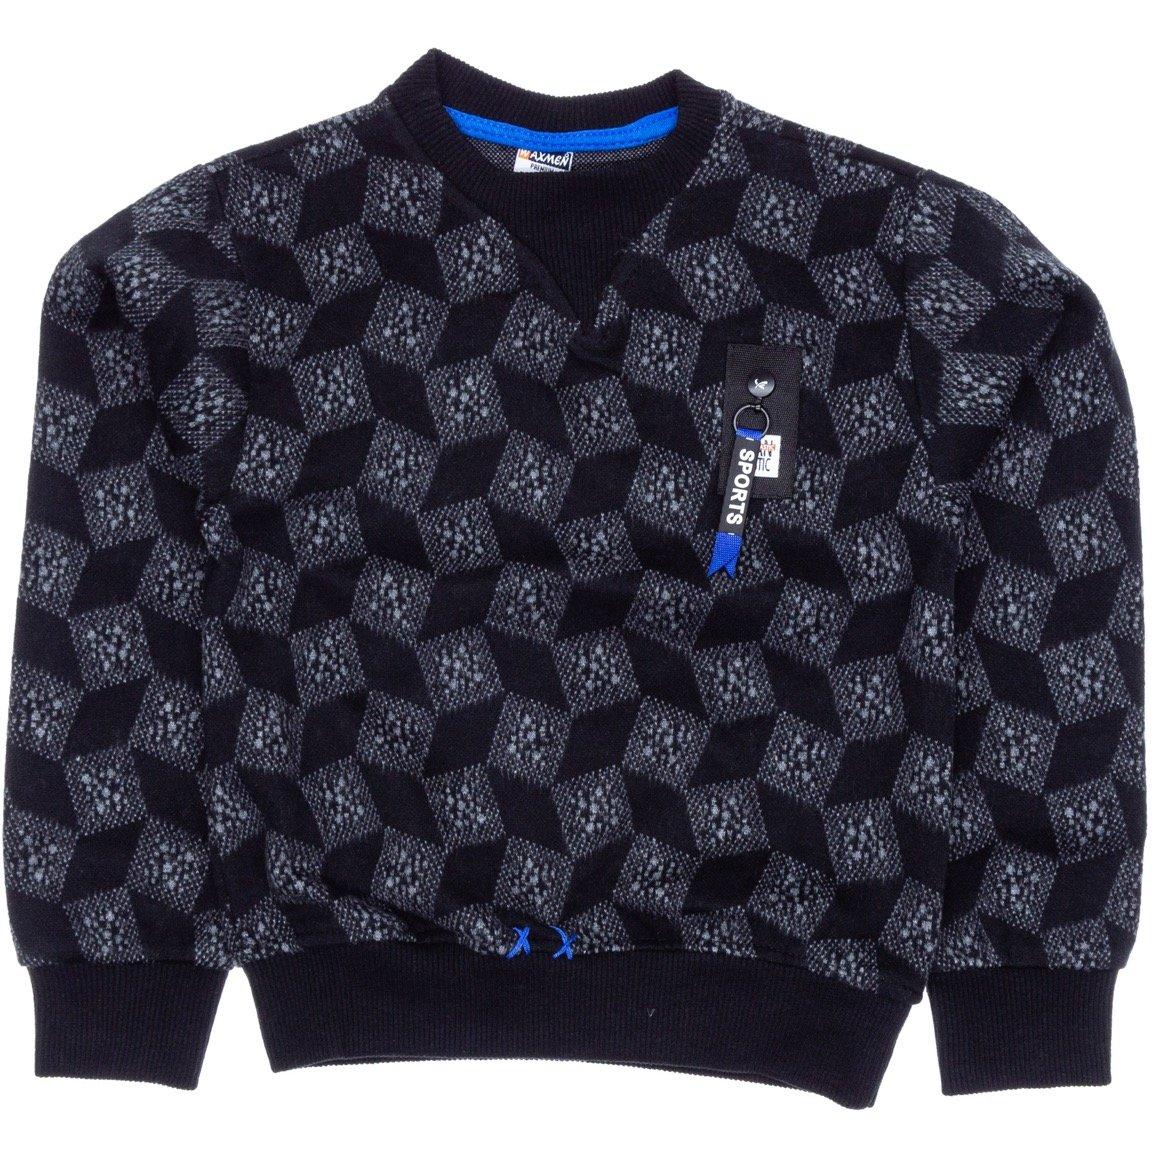 Waxmen παιδική μπλούζα «Man Tastic»